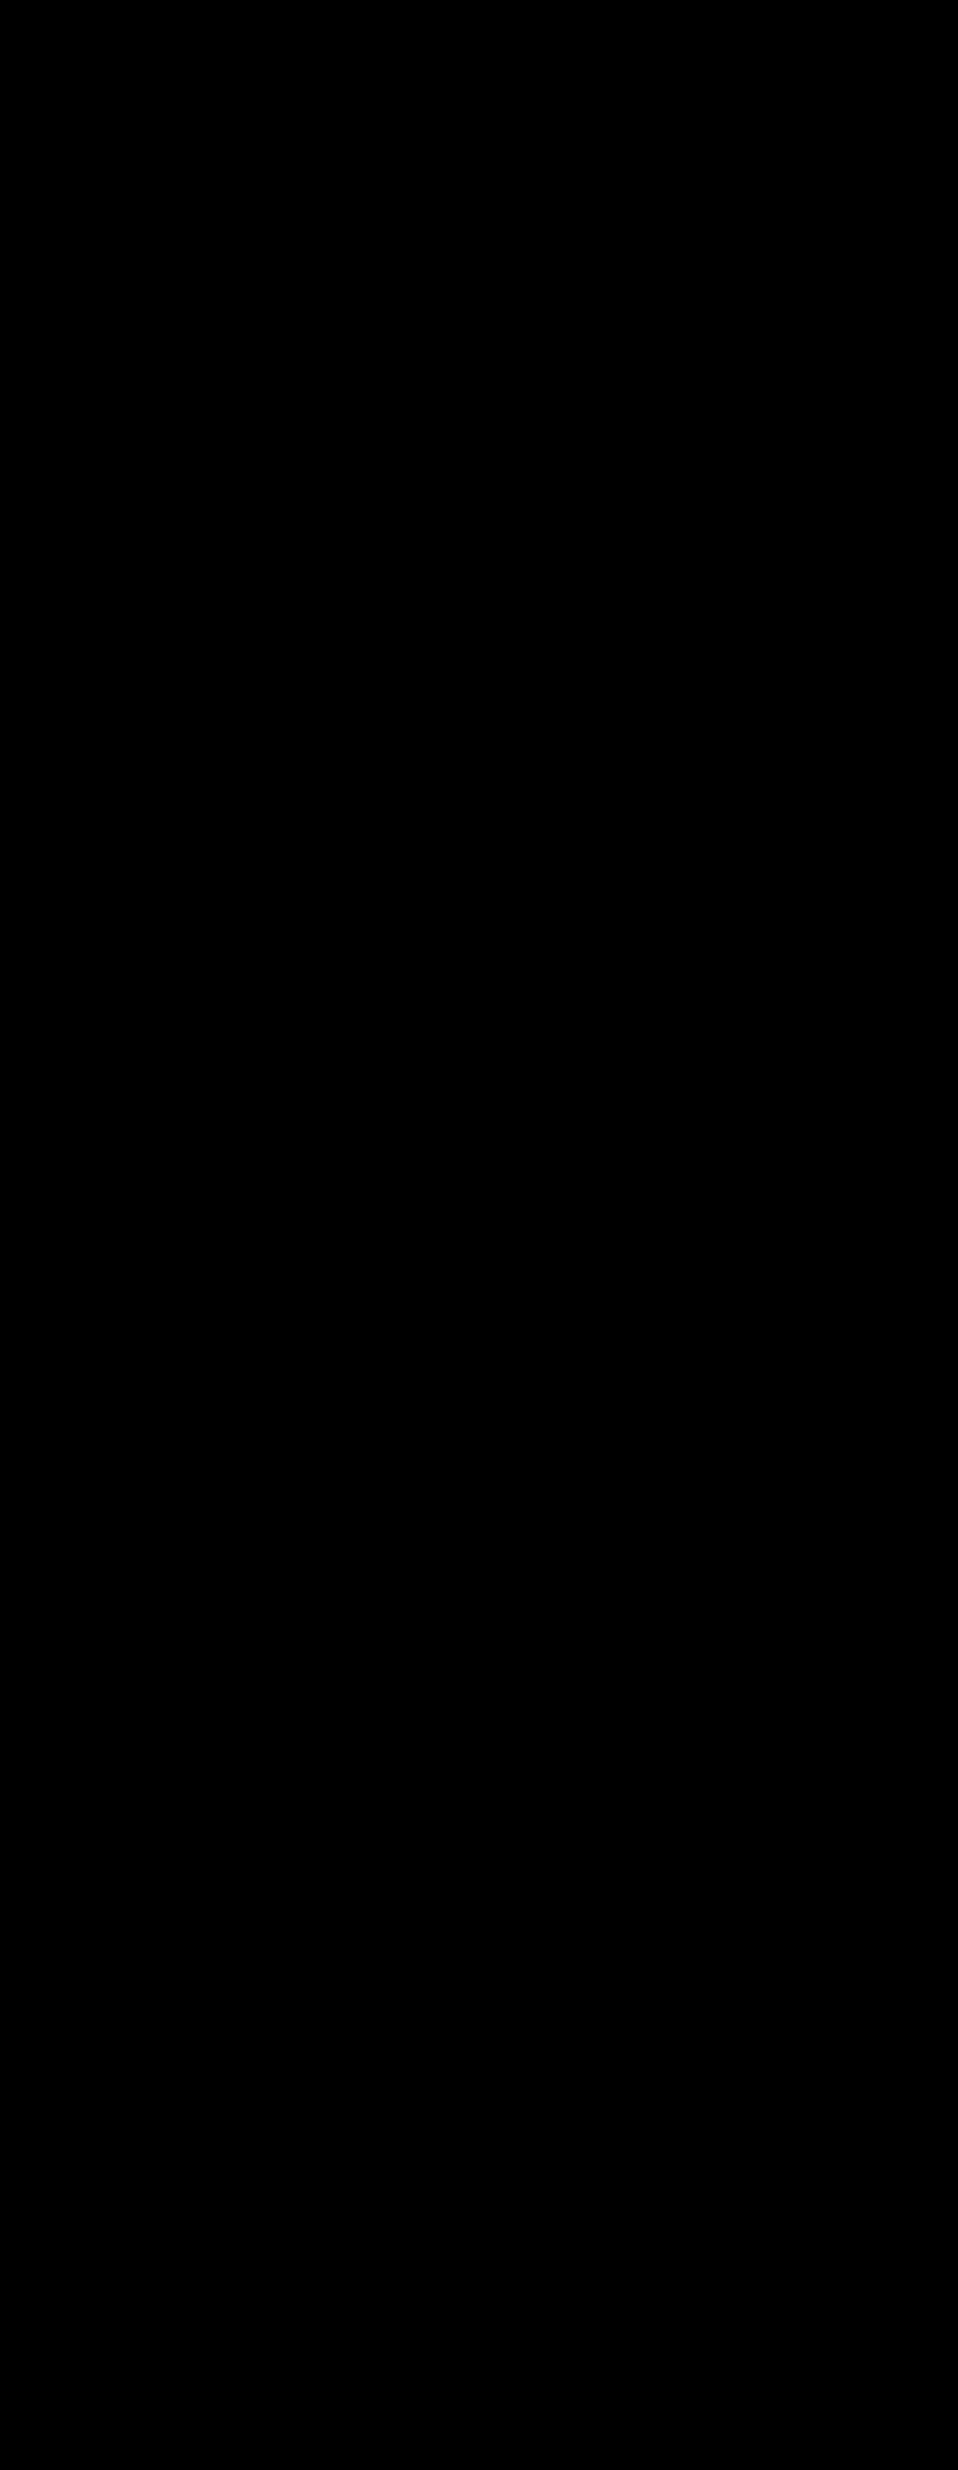 Girl gymnastics silhouette panda. Race clipart hurdler